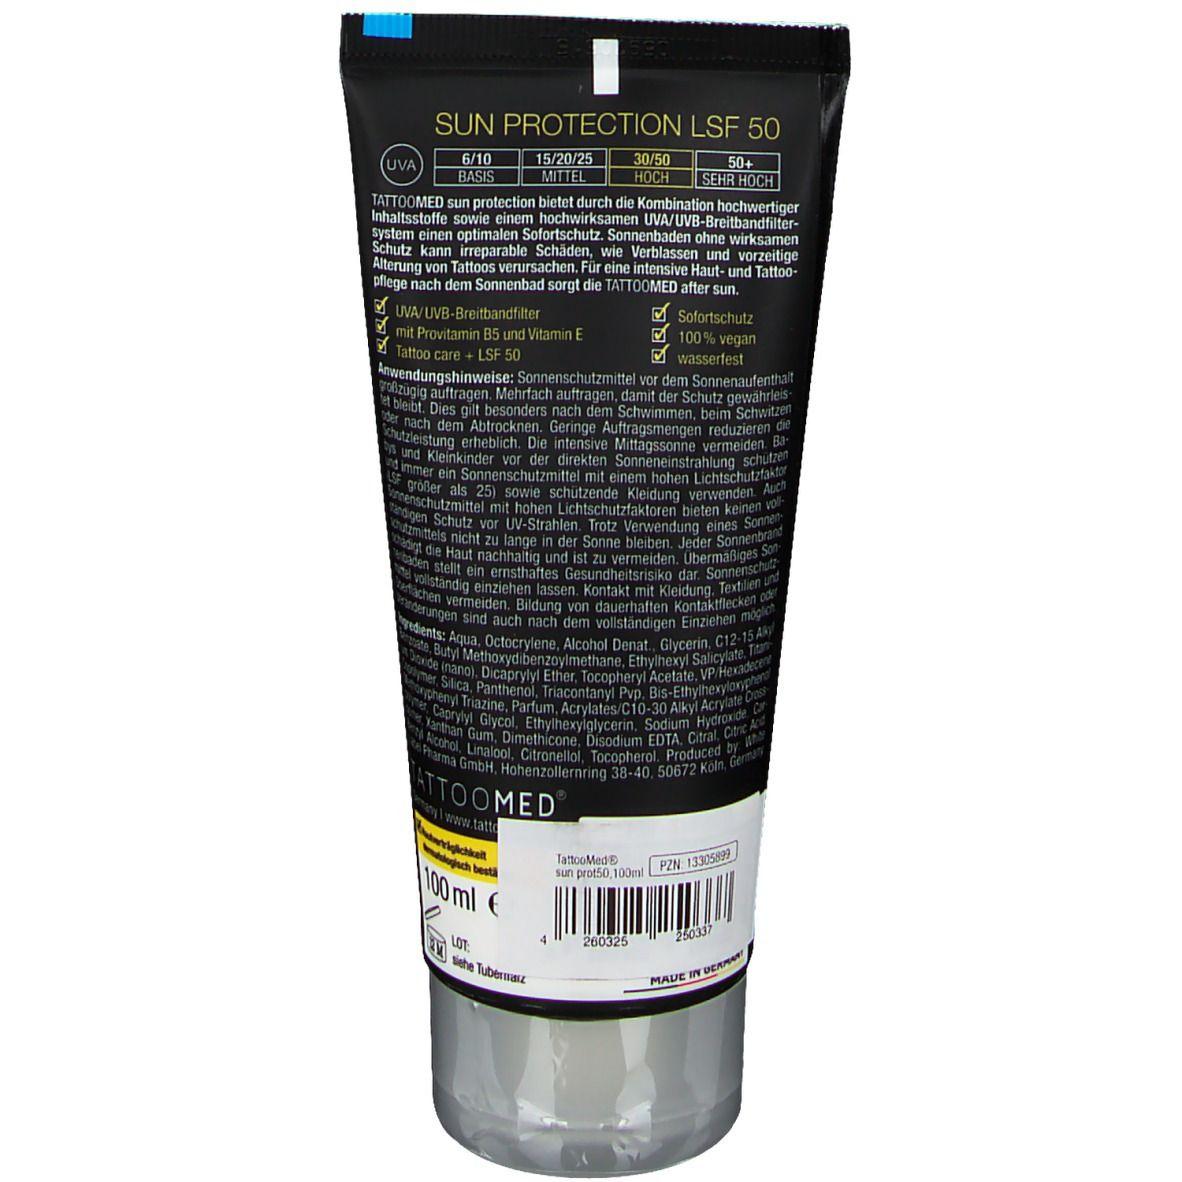 TattooMed® sun protection LSF 50